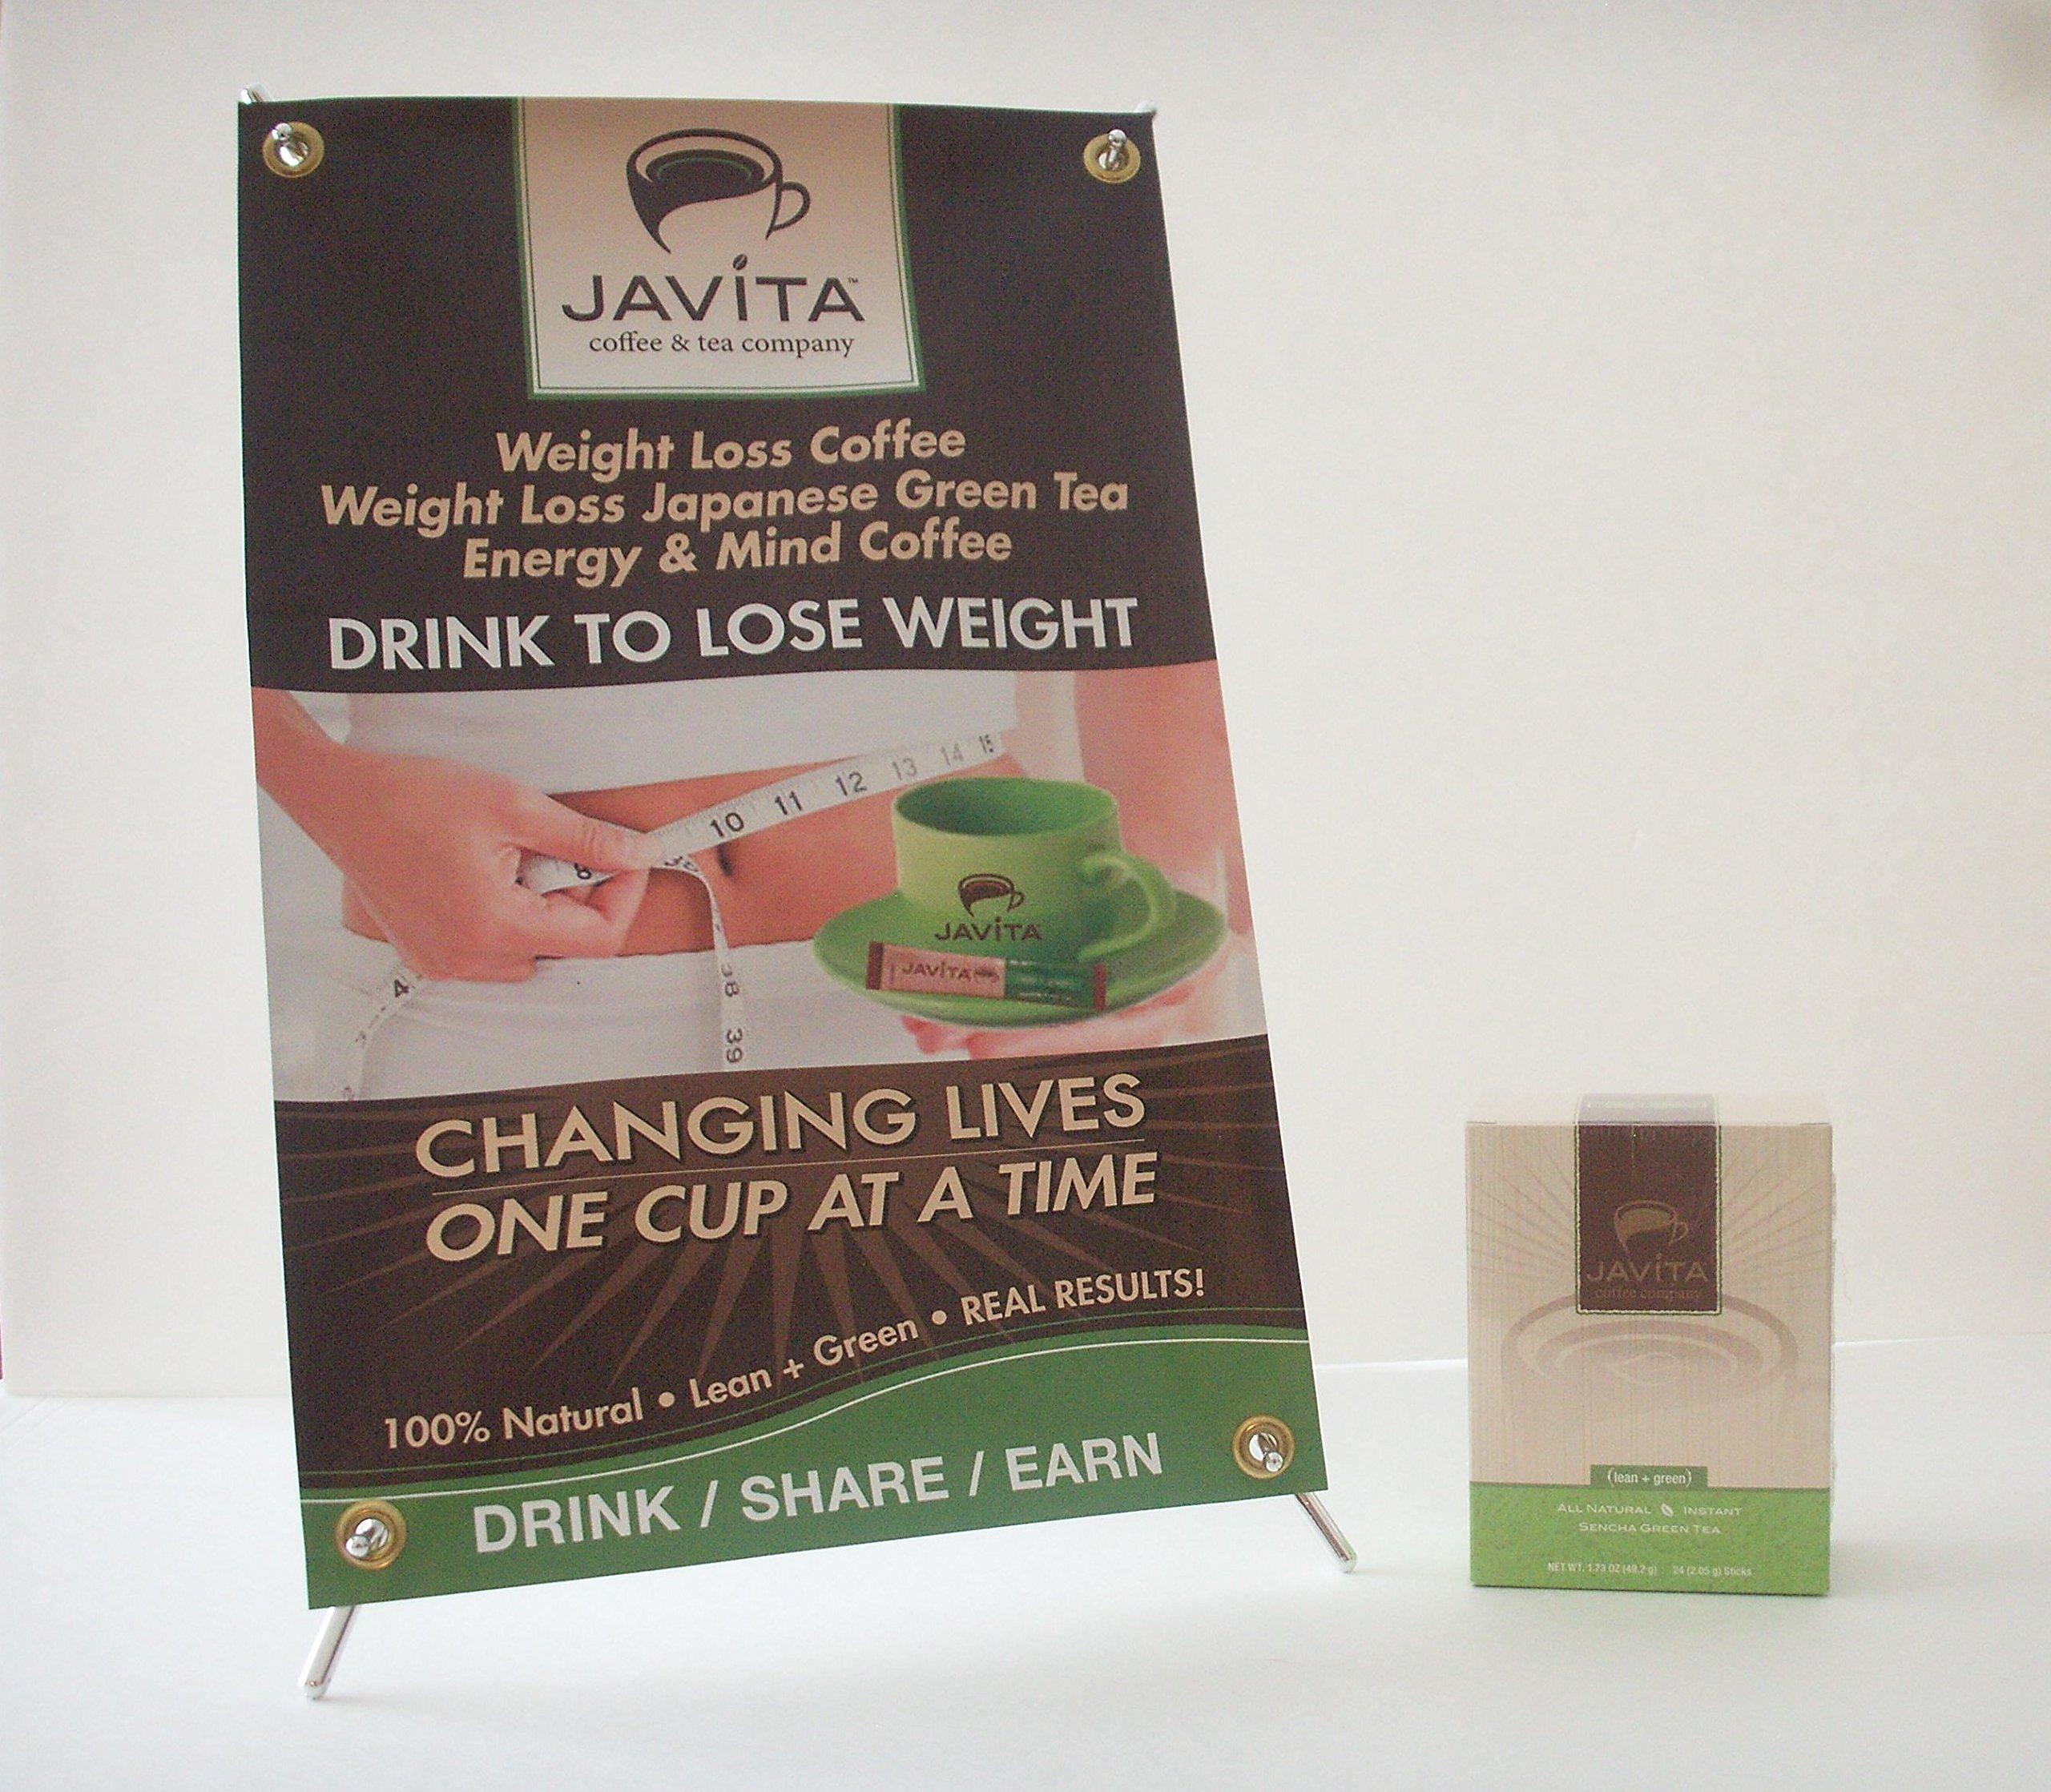 Weight loss irregular bowel movements